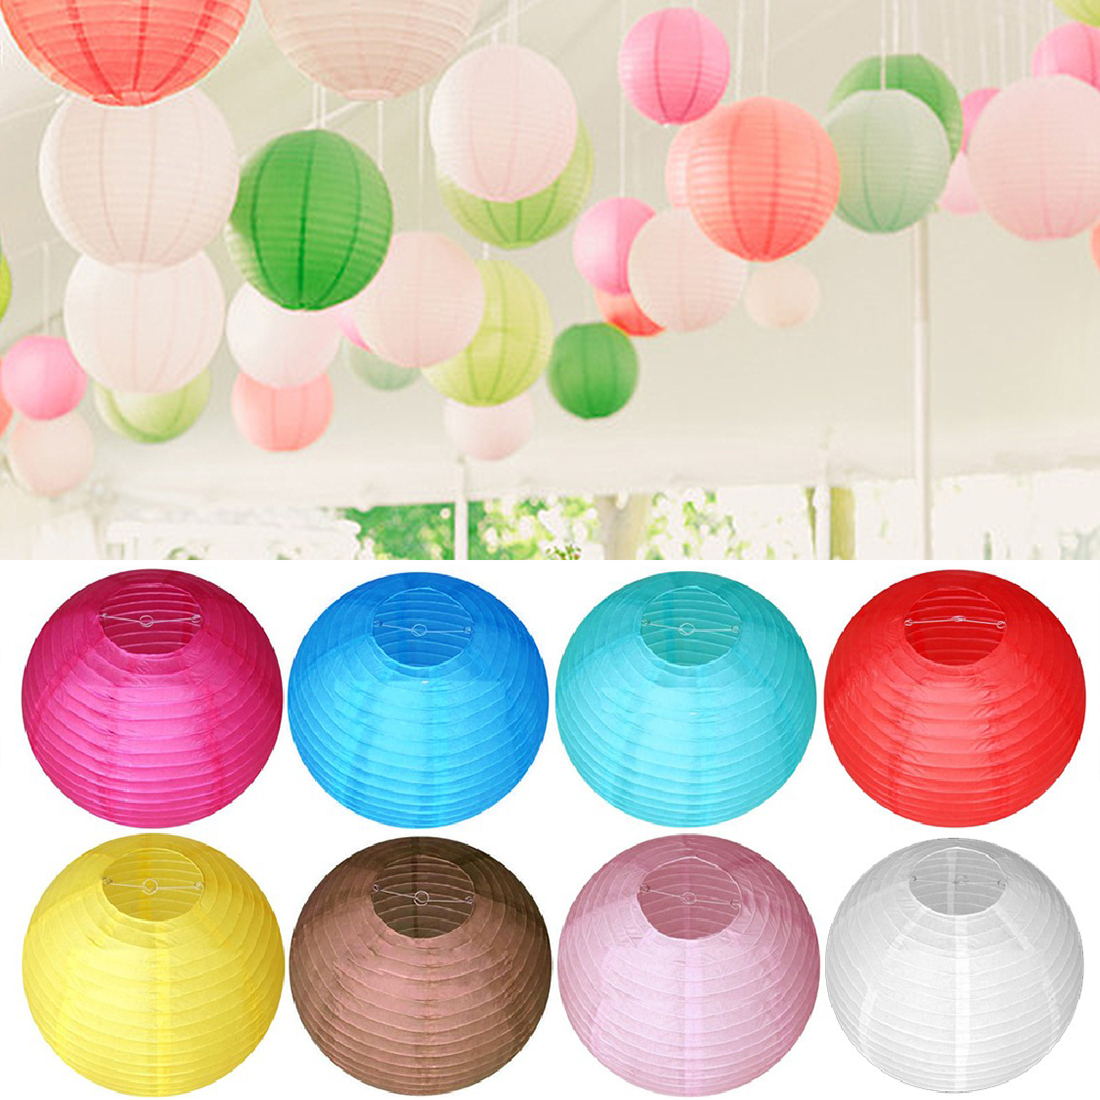 Nice Round Chinese Paper Lantern Birthday Wedding Party Decor Gift Craft DIY Lamp White Hanging Lantern Ball Party Supplies 20cm